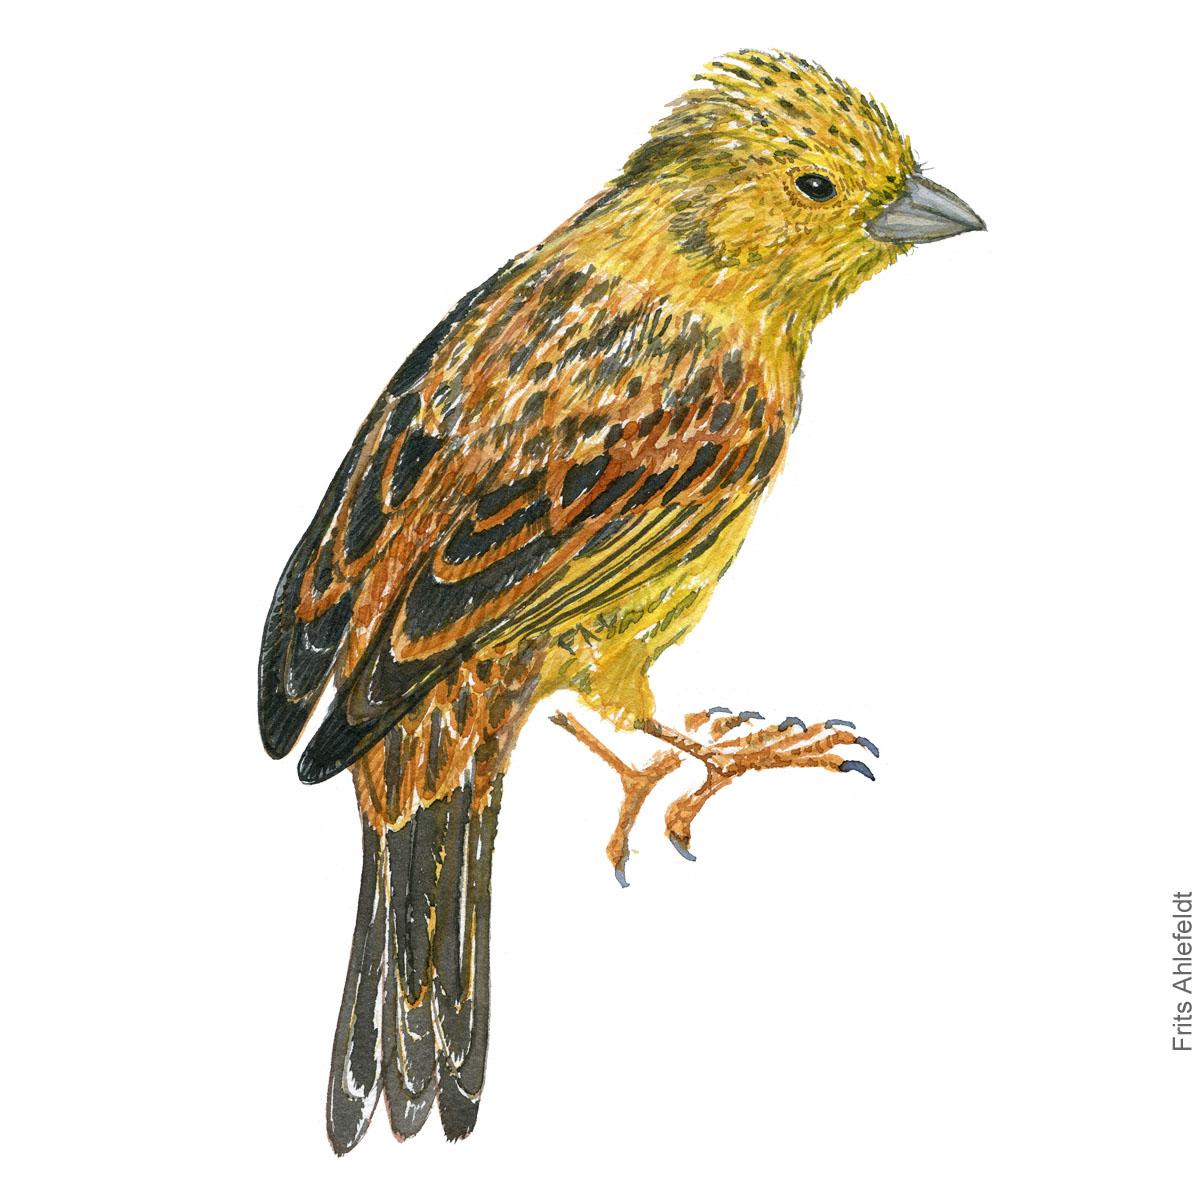 Guldspurv - Yellow hammer watercolor illustration. Painting by Frits Ahlefeldt - Fugle akvarel tegning